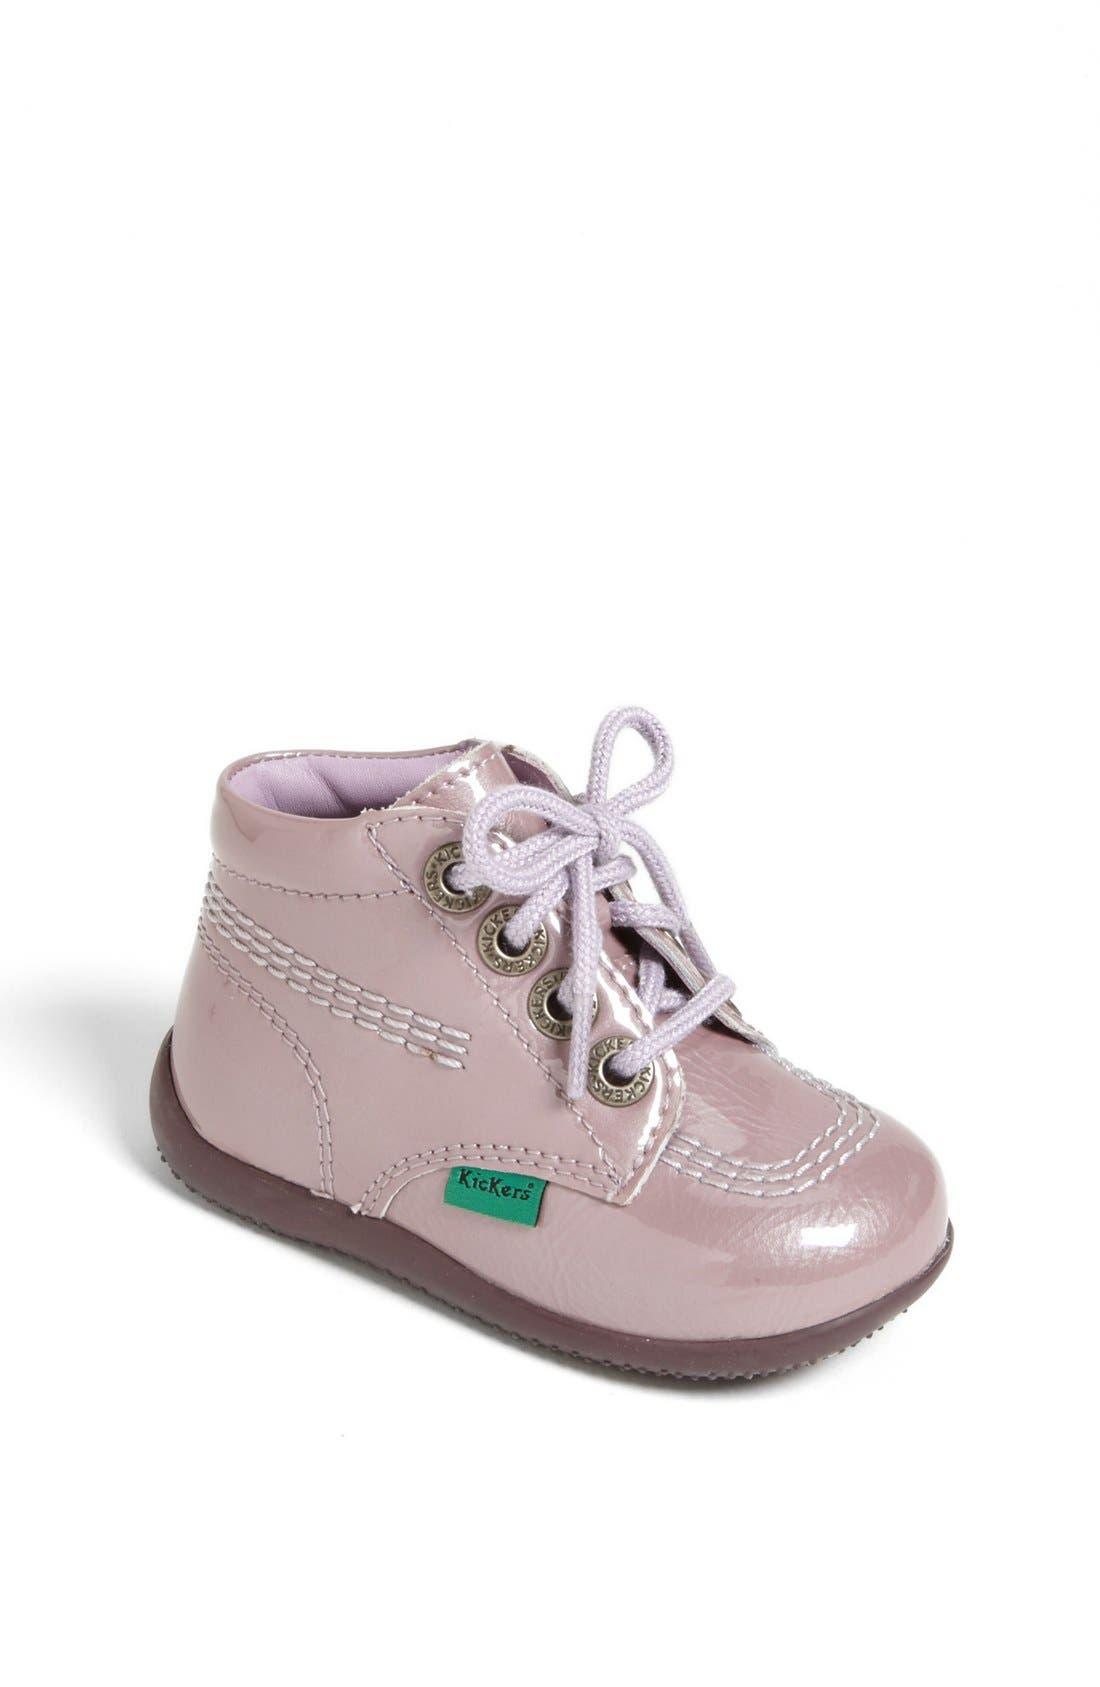 Alternate Image 1 Selected - Kickers 'Billy 4' Boot (Baby, Walker & Toddler)